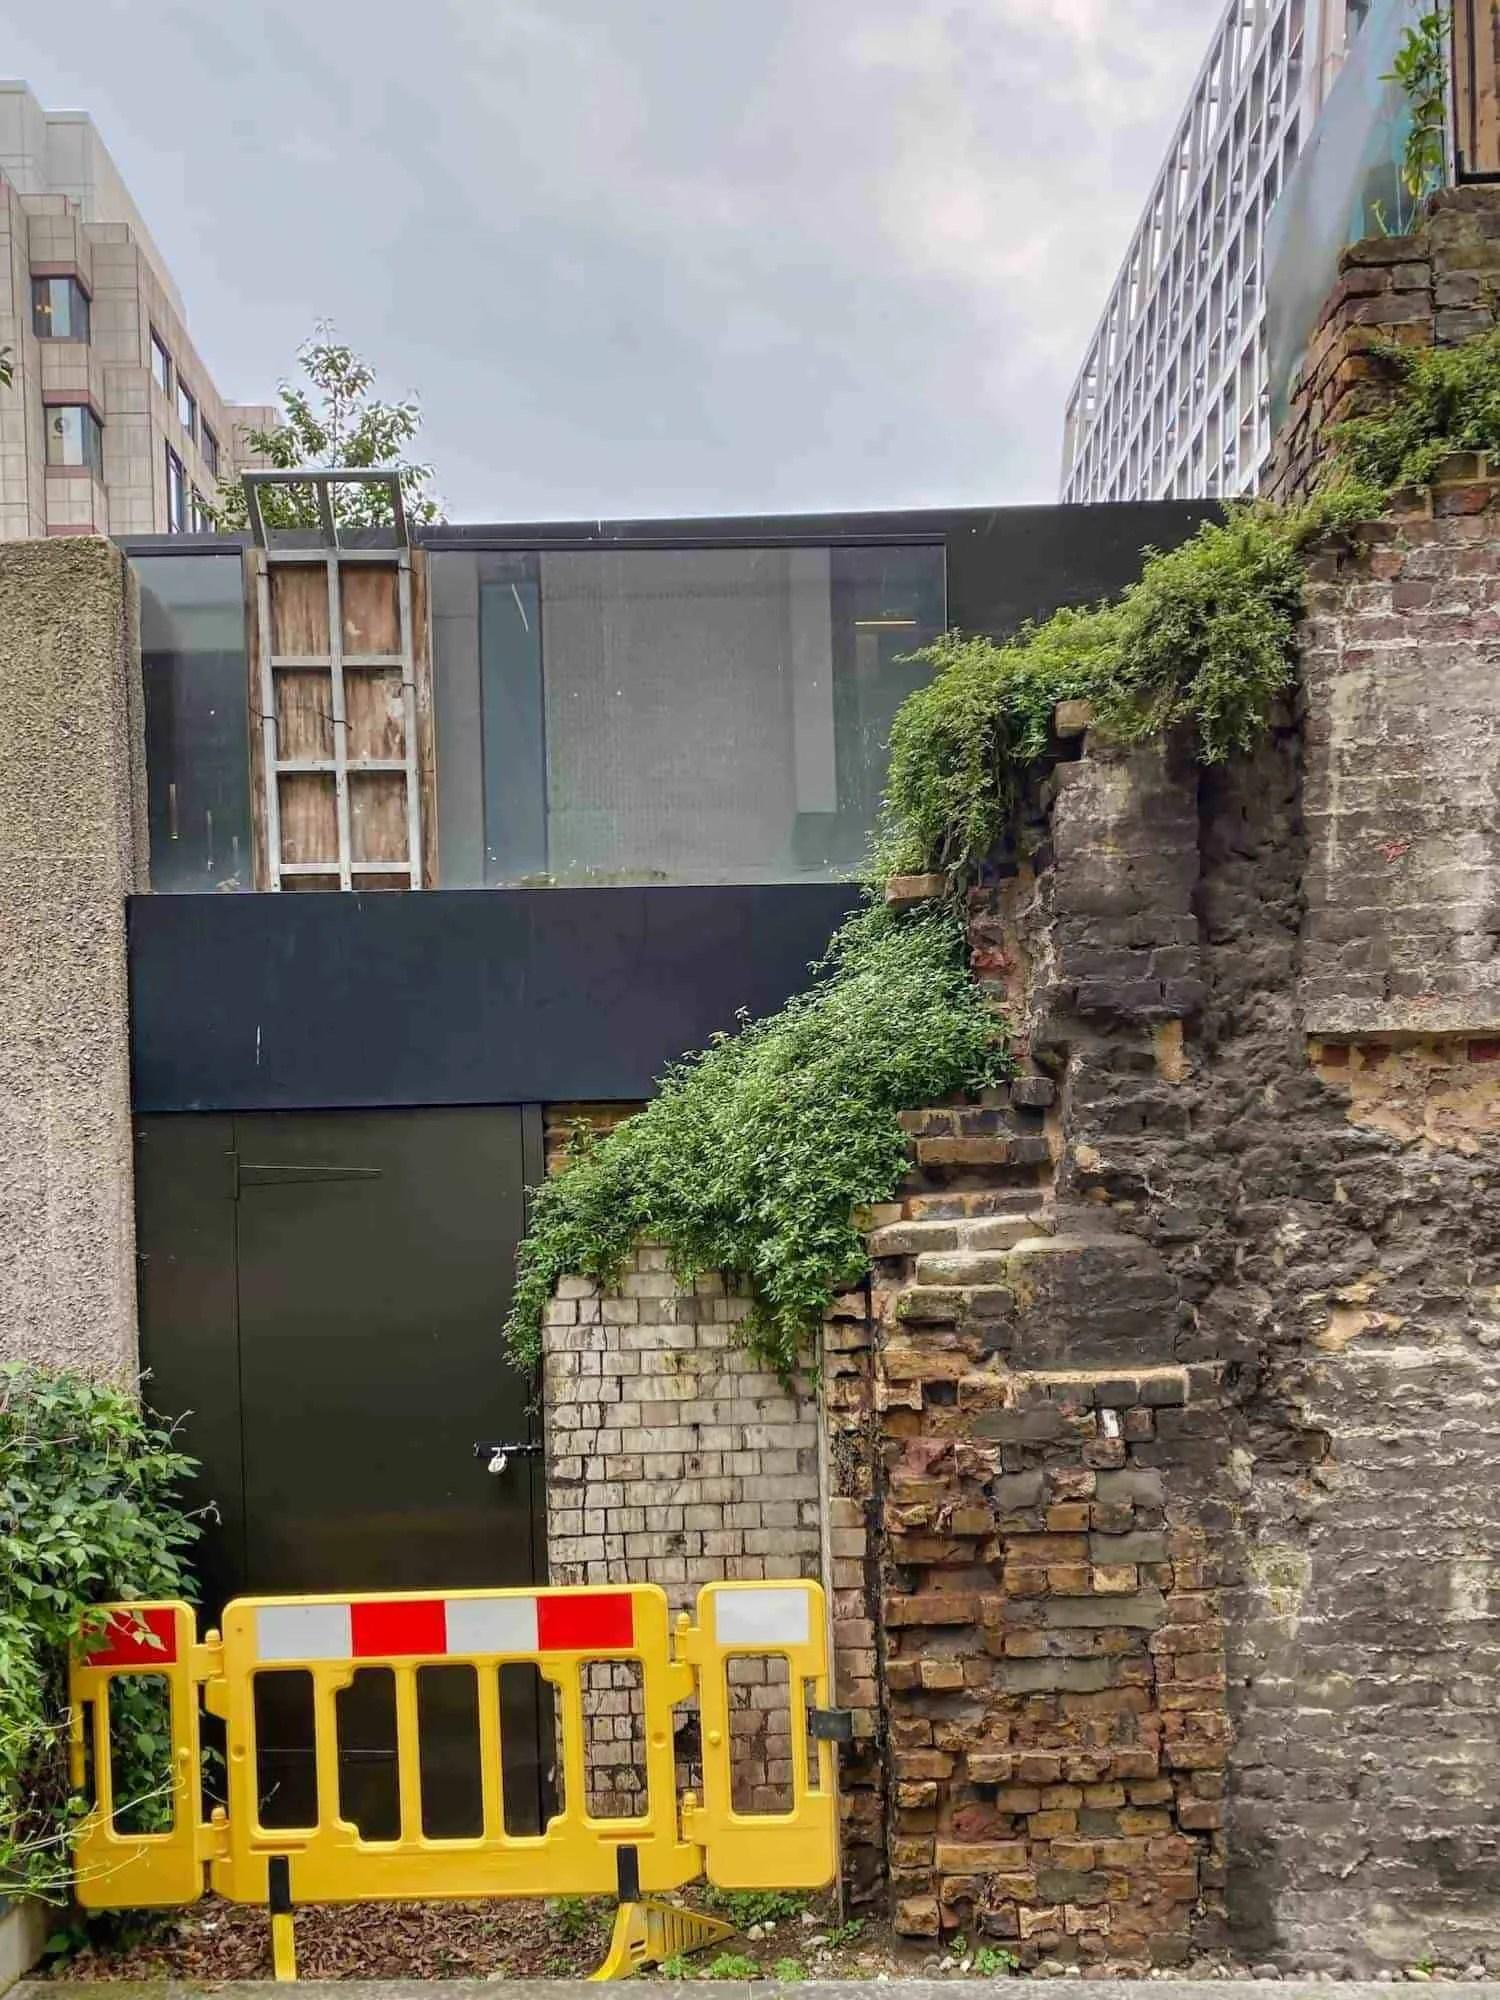 London Wall Walk - Plaque 12